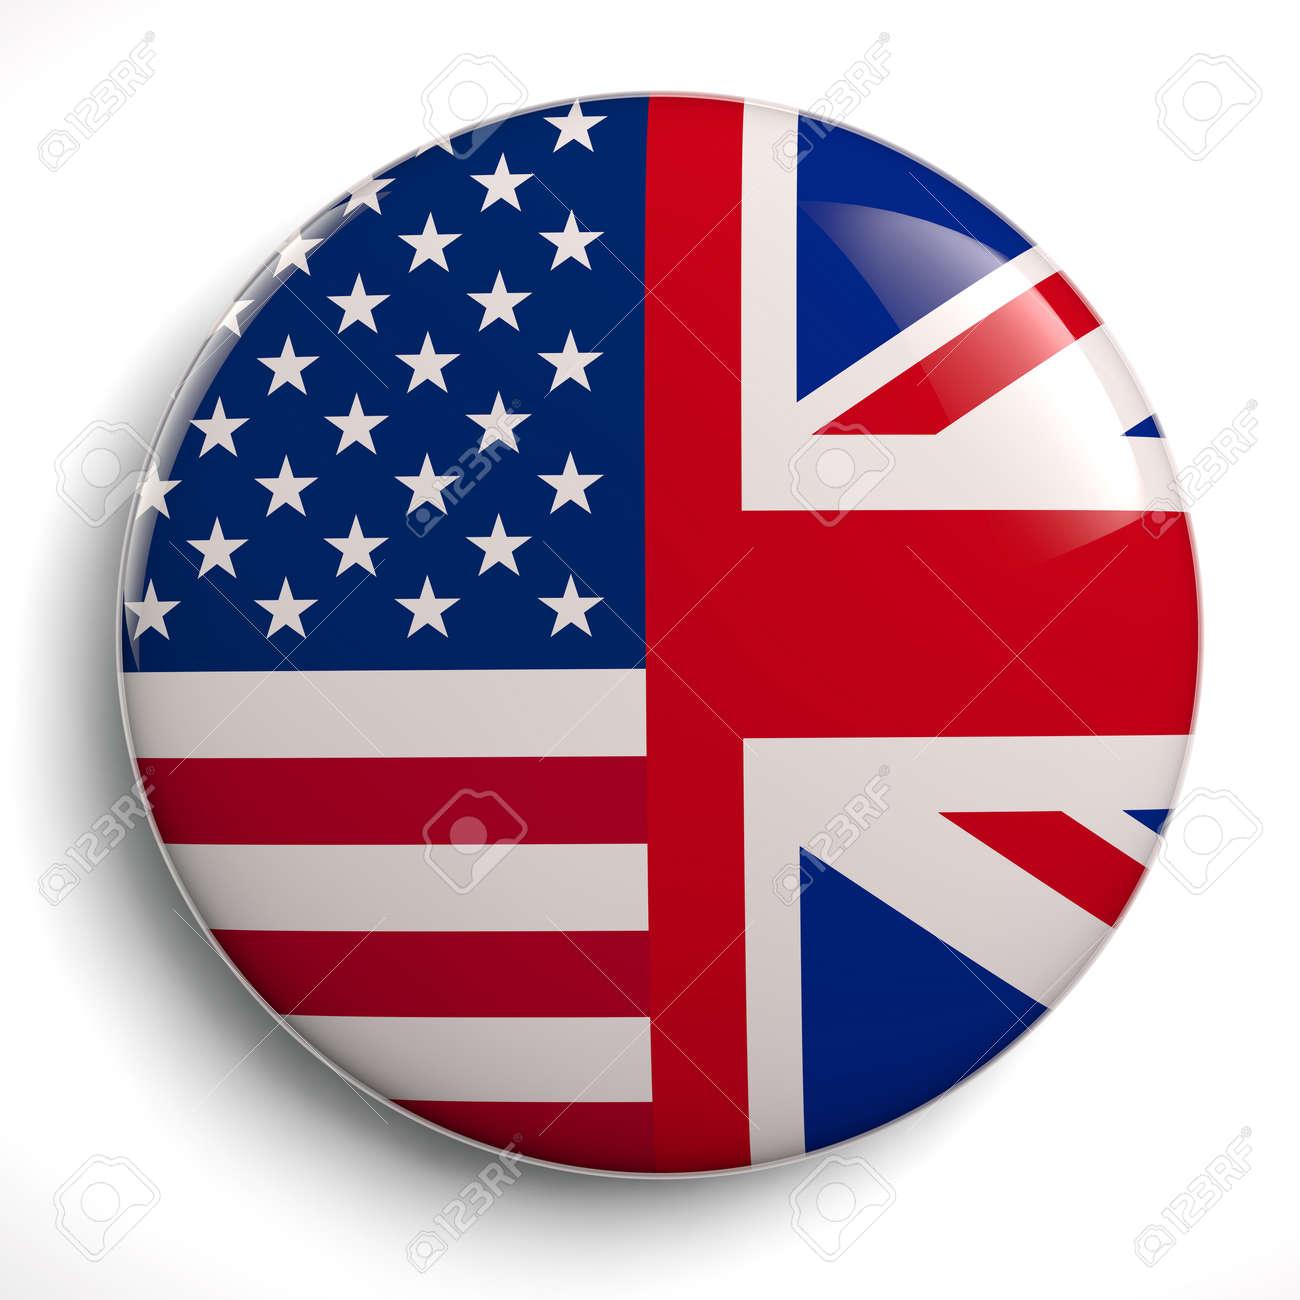 USA - UK Speacial Relationship Flags Circle Symbol - 3D Illustration - 147119581